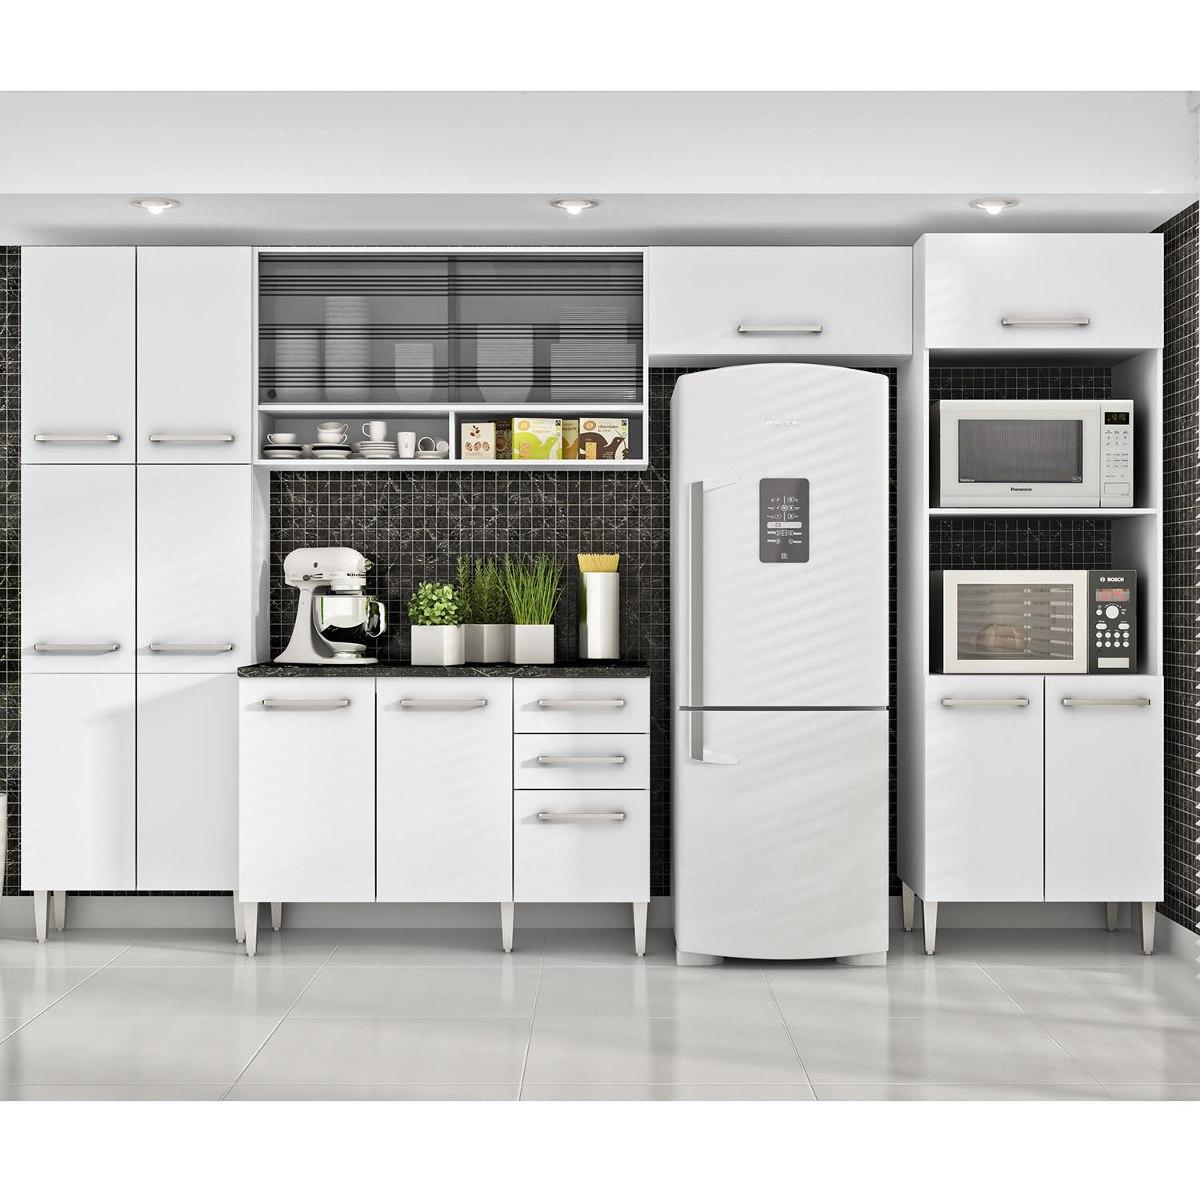 Cozinha Completa 5 Pe As Iris Glamy Madesa Branco Vid Hcwt R